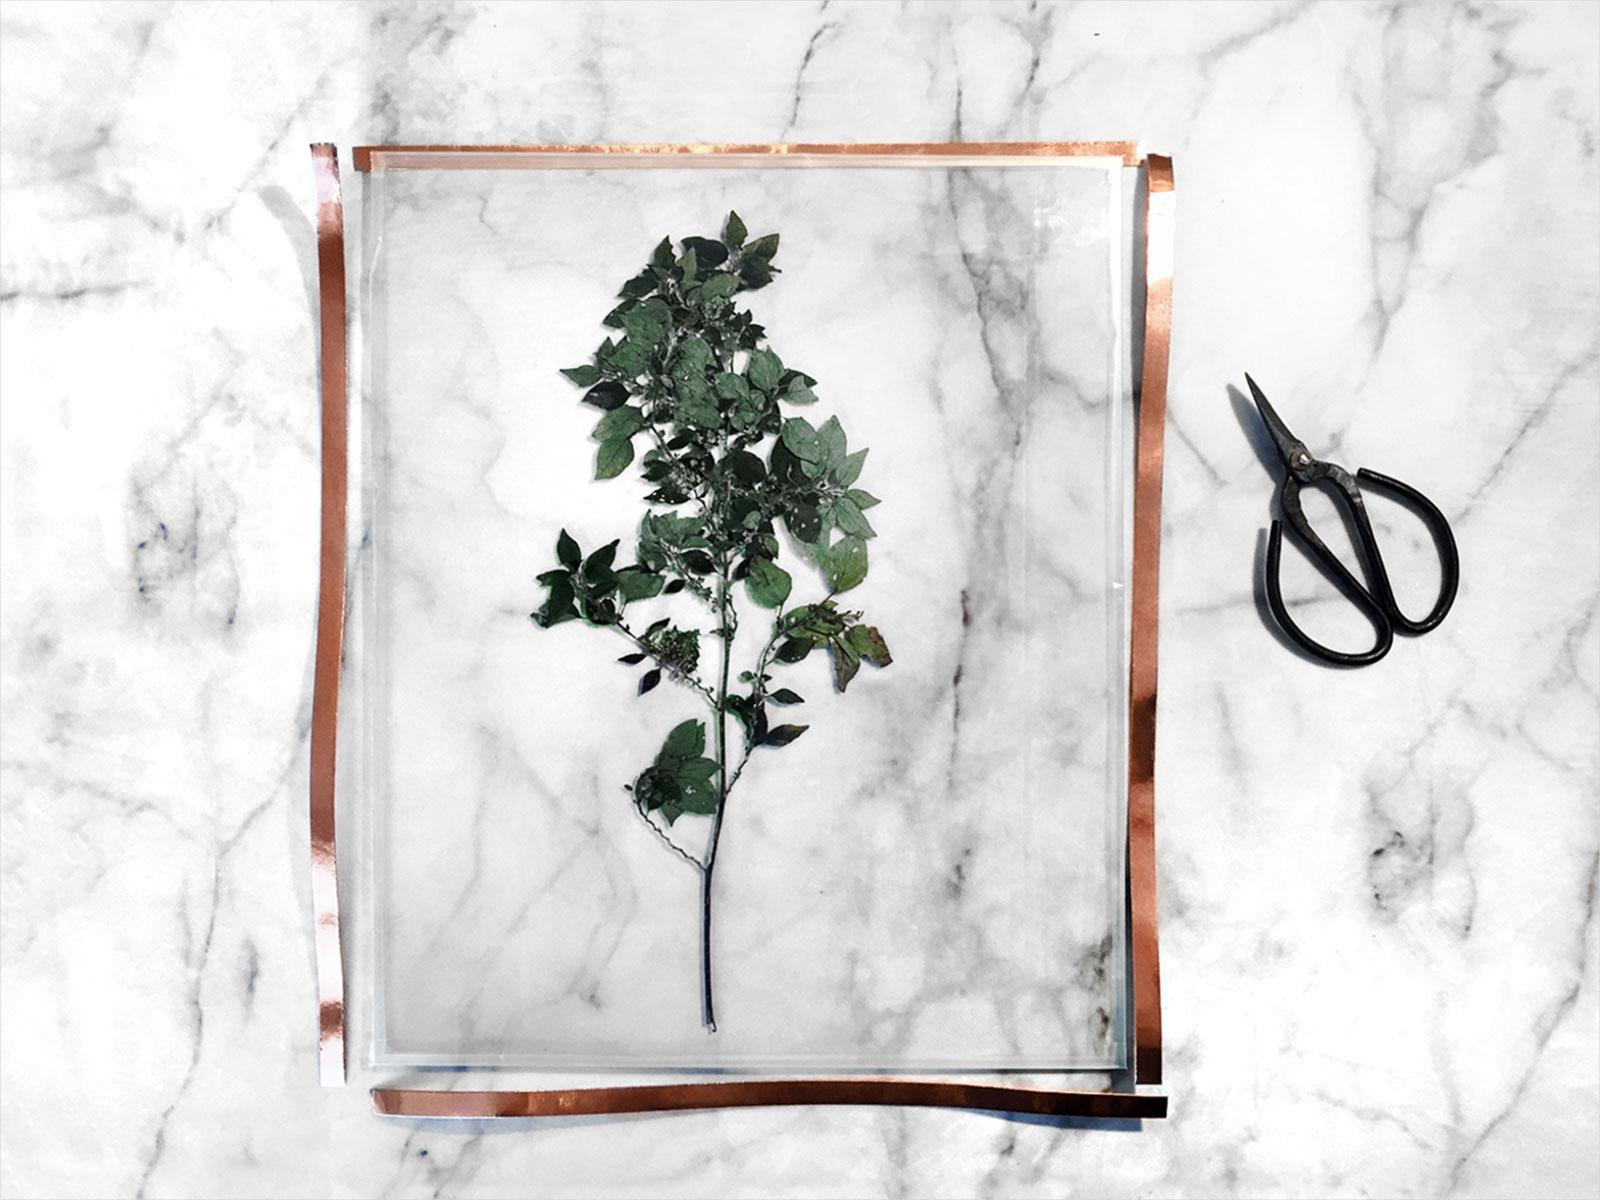 diy-herbier-cuivre-cadre-verre-do-it-yourself-inspiration-tendance-tutoriel